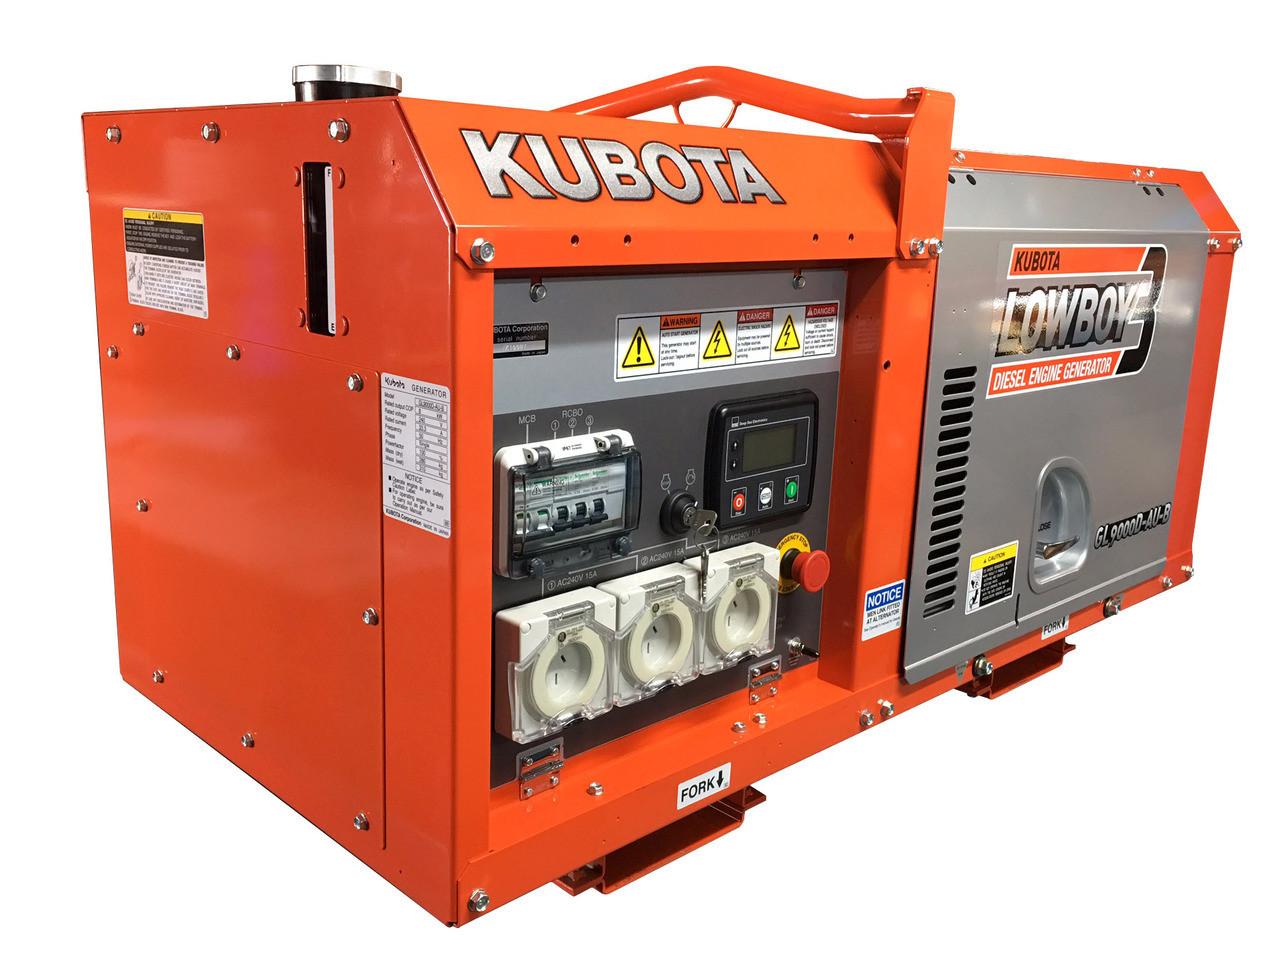 Kubota Generator 9KVA - GL9000 Lowboy 3 - DeepSea Controller